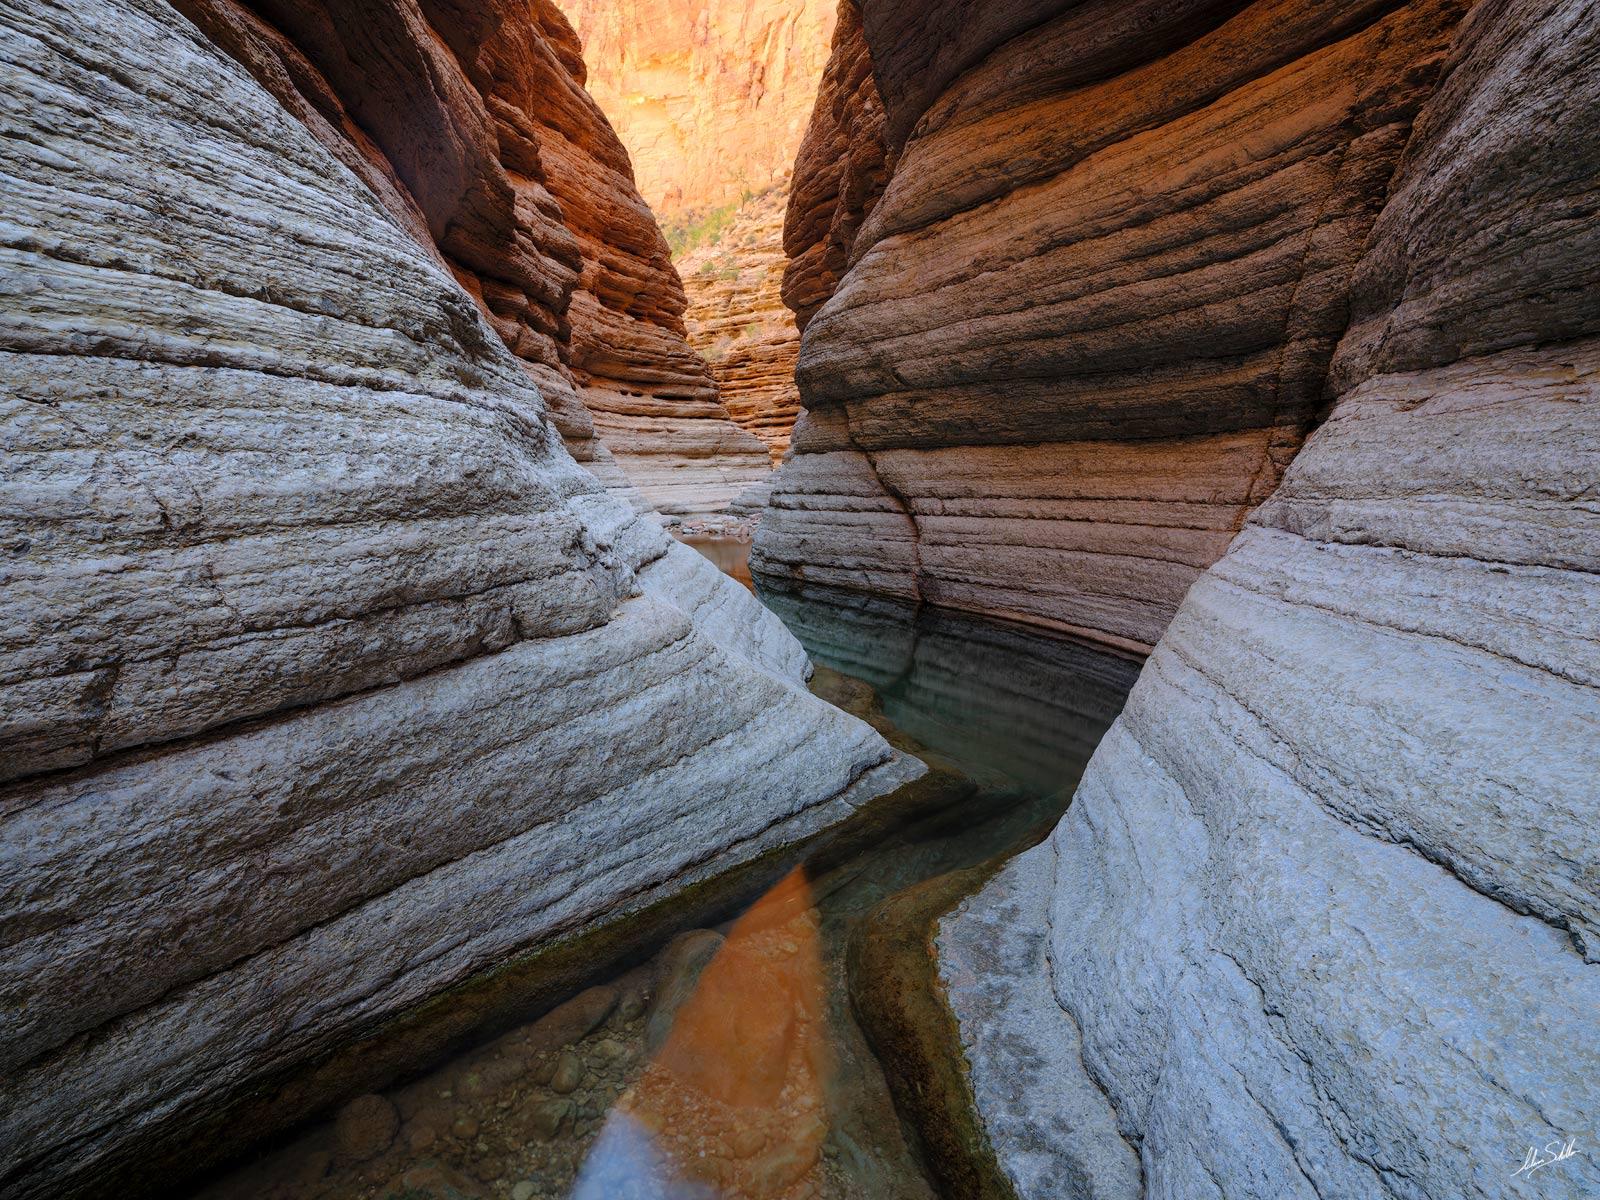 Colorado River, Expedition, FujiFilm, GFX, GFX 100, Grand Canyon, Matkat, Matkatamiba, National Park, River Trip, photo